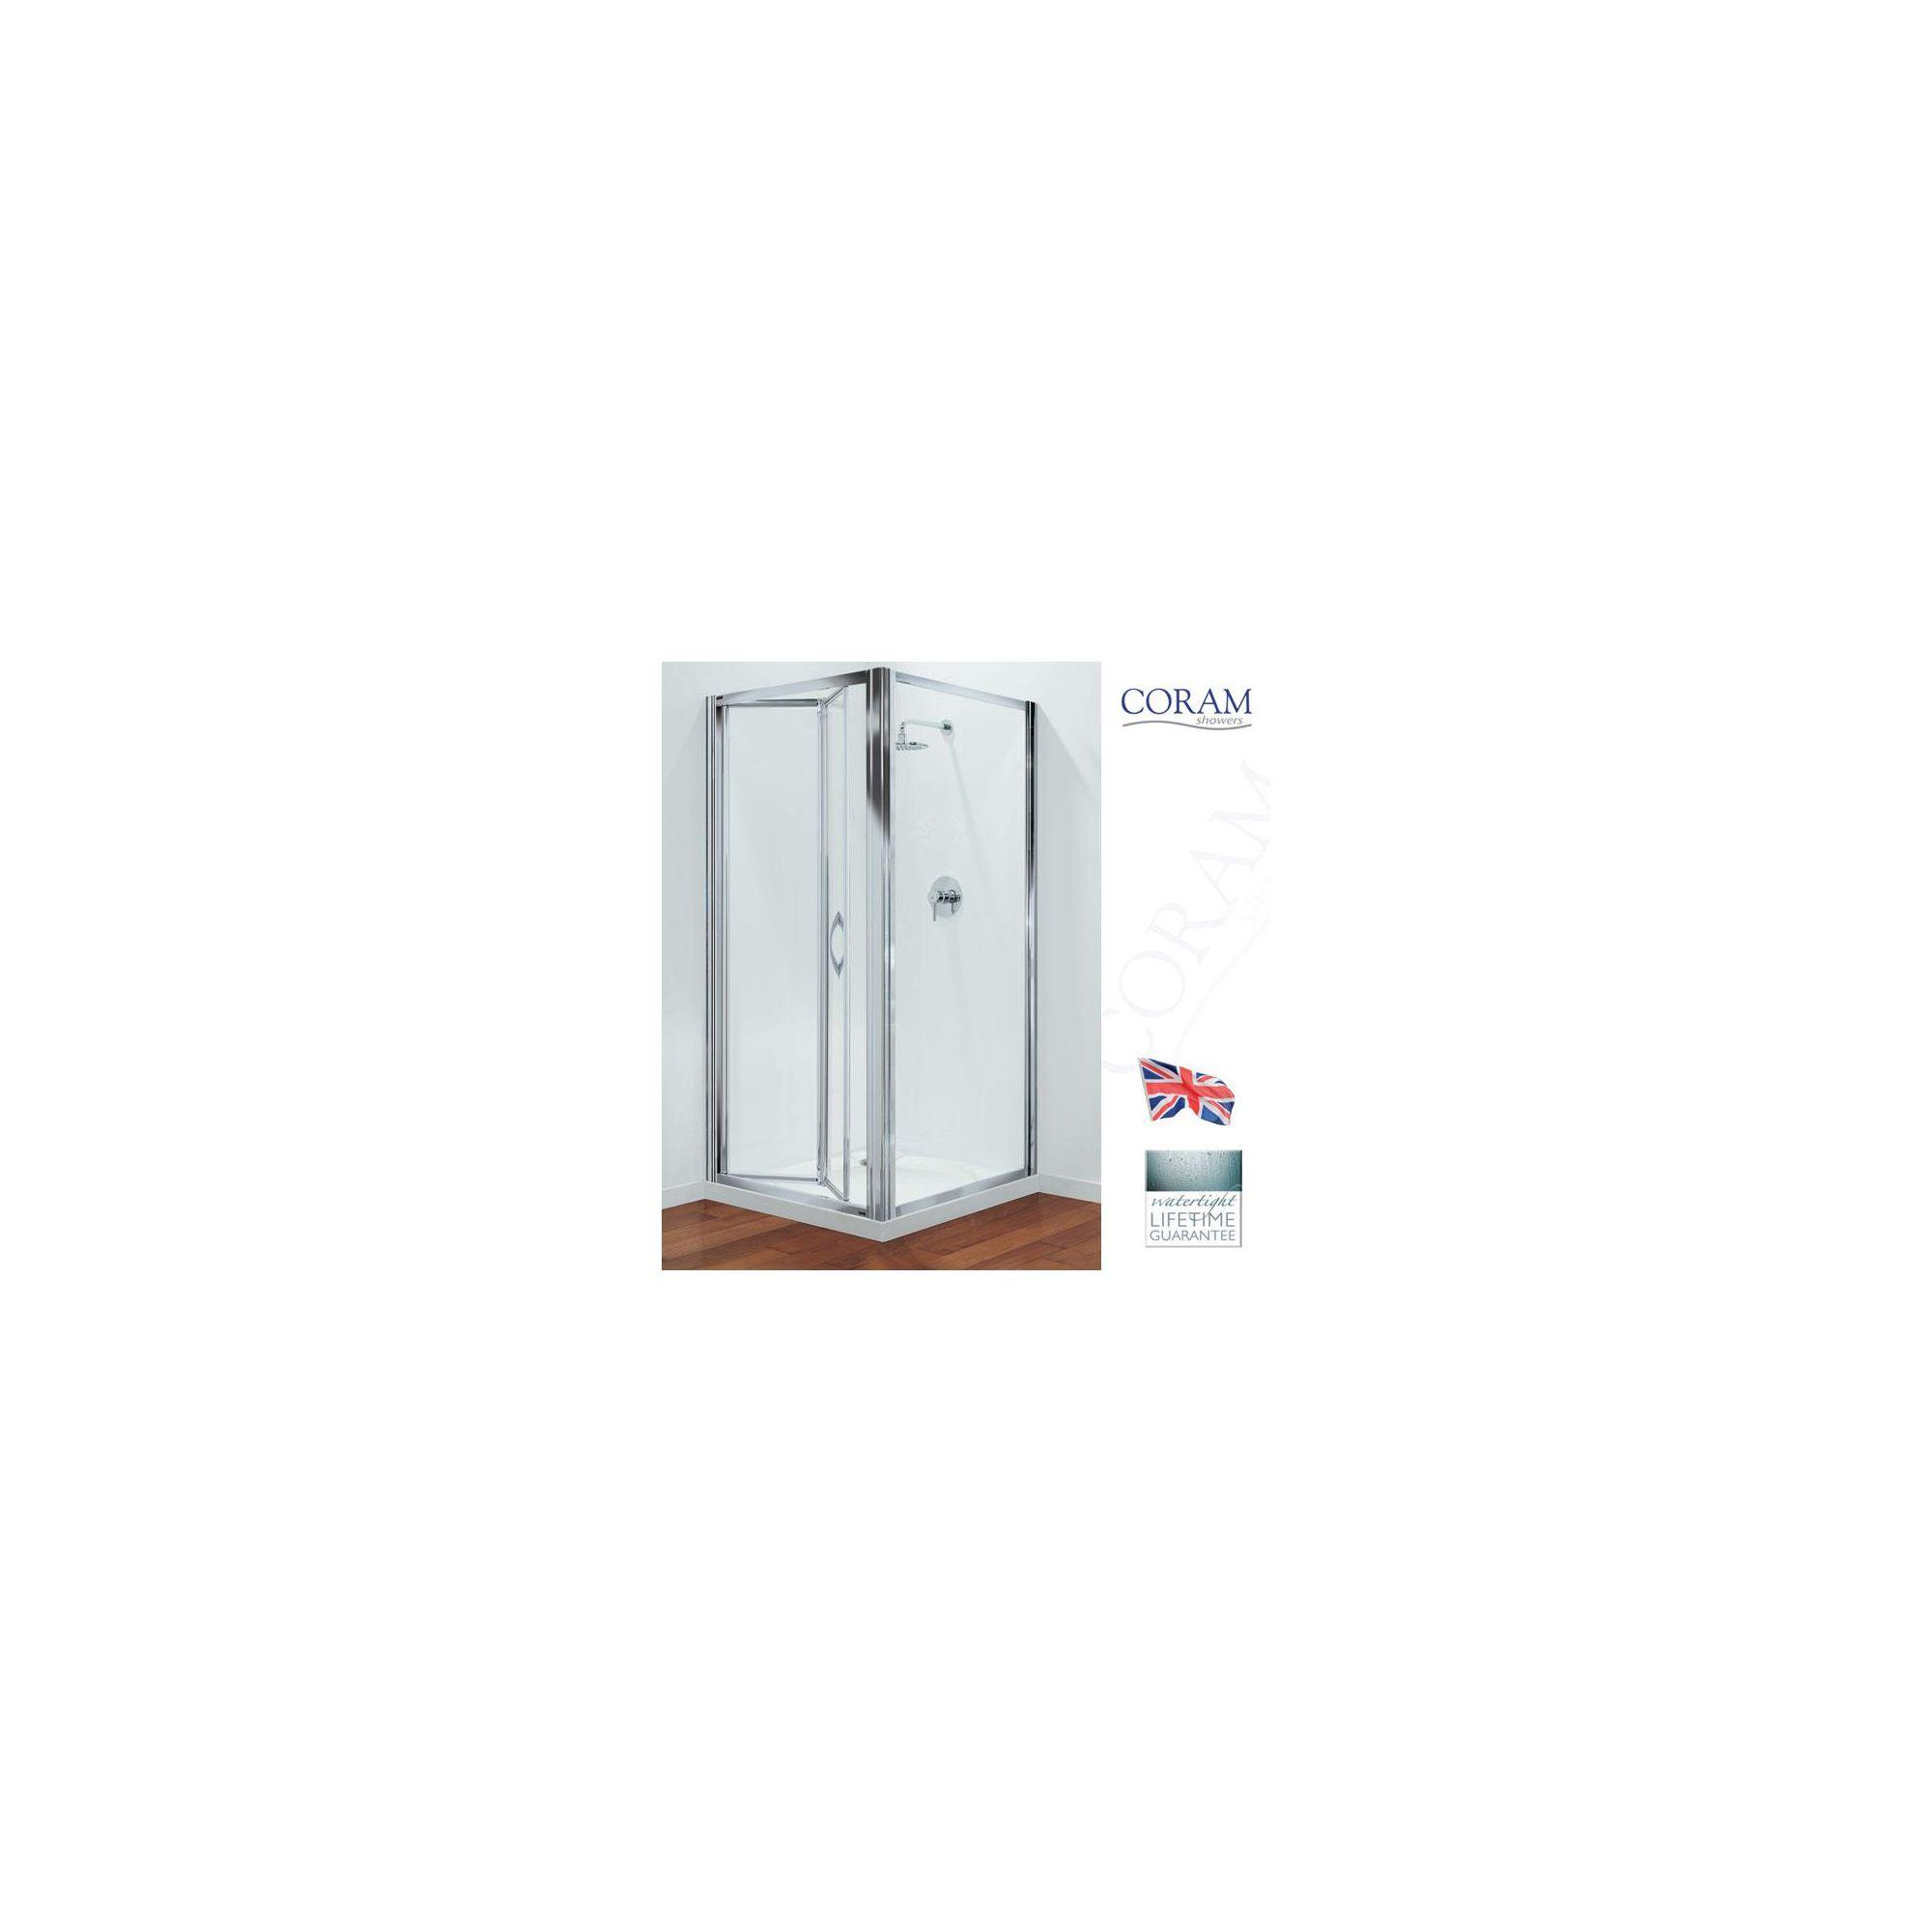 Coram Premier Bi-Fold Door Shower Enclosure, 900mm x 900mm, Low Profile Tray, 6mm Glass at Tescos Direct